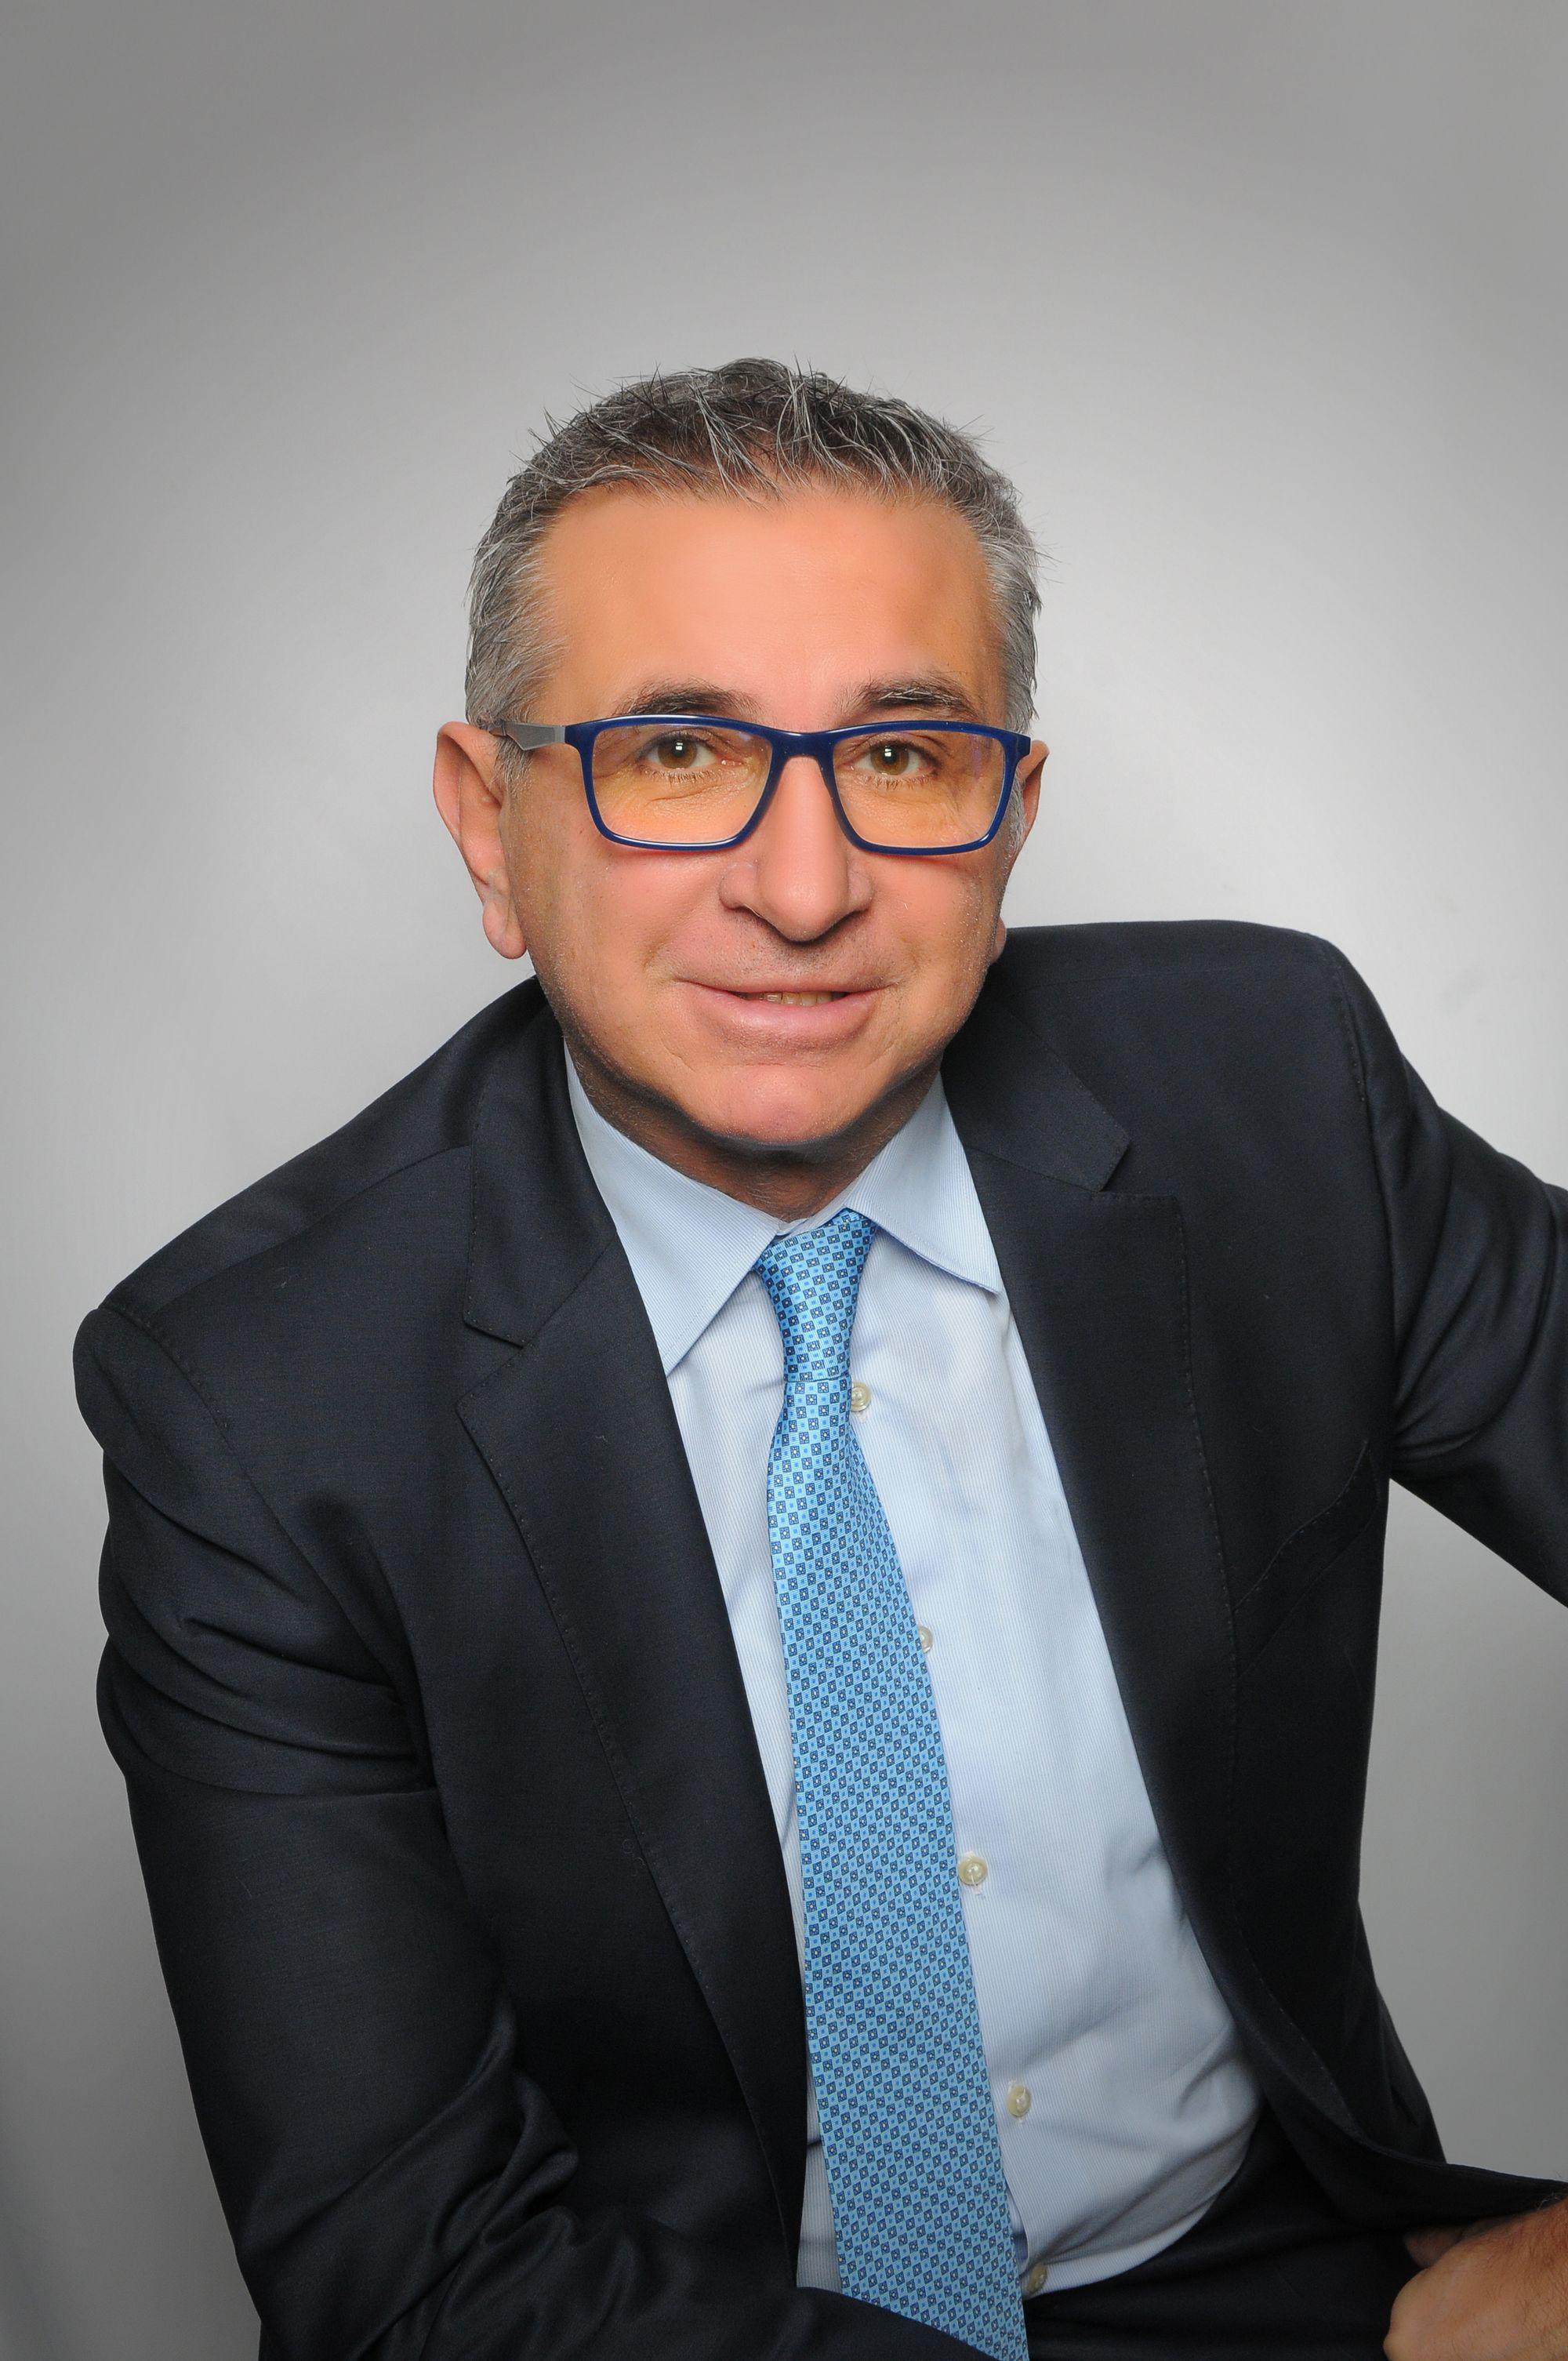 Adriano Paolo Marcotulli